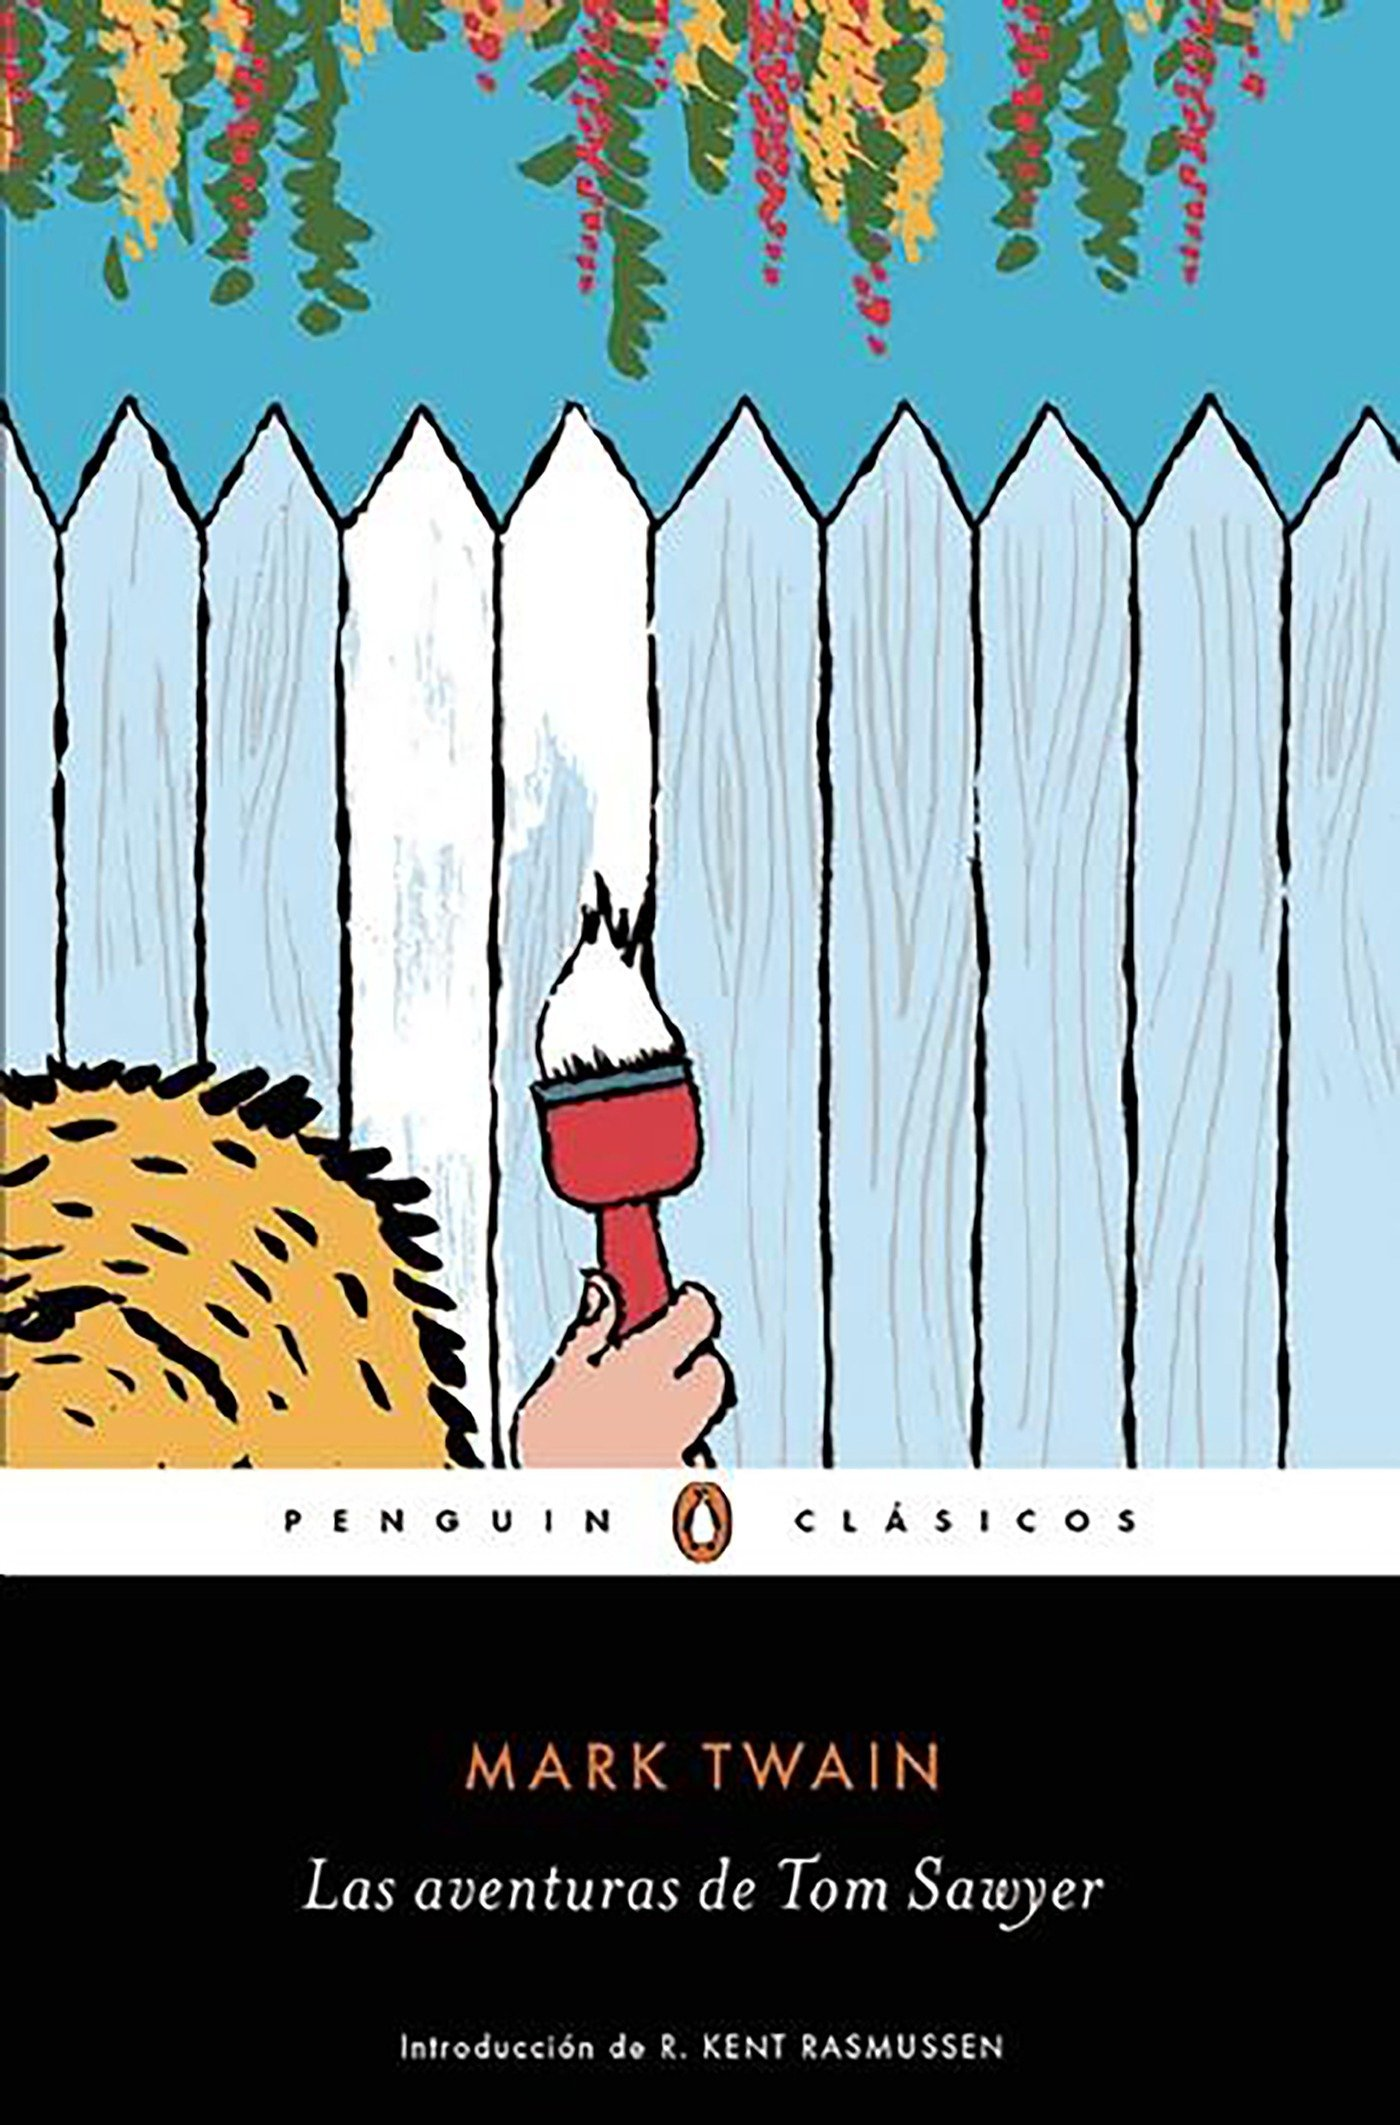 Las aventuras de Tom Sawyer (PENGUIN CLÁSICOS) Libro de bolsillo – 18 feb 2016 Mark Twain NEUS; NUENO COBAS PENGUIN CLASICOS 849105166X